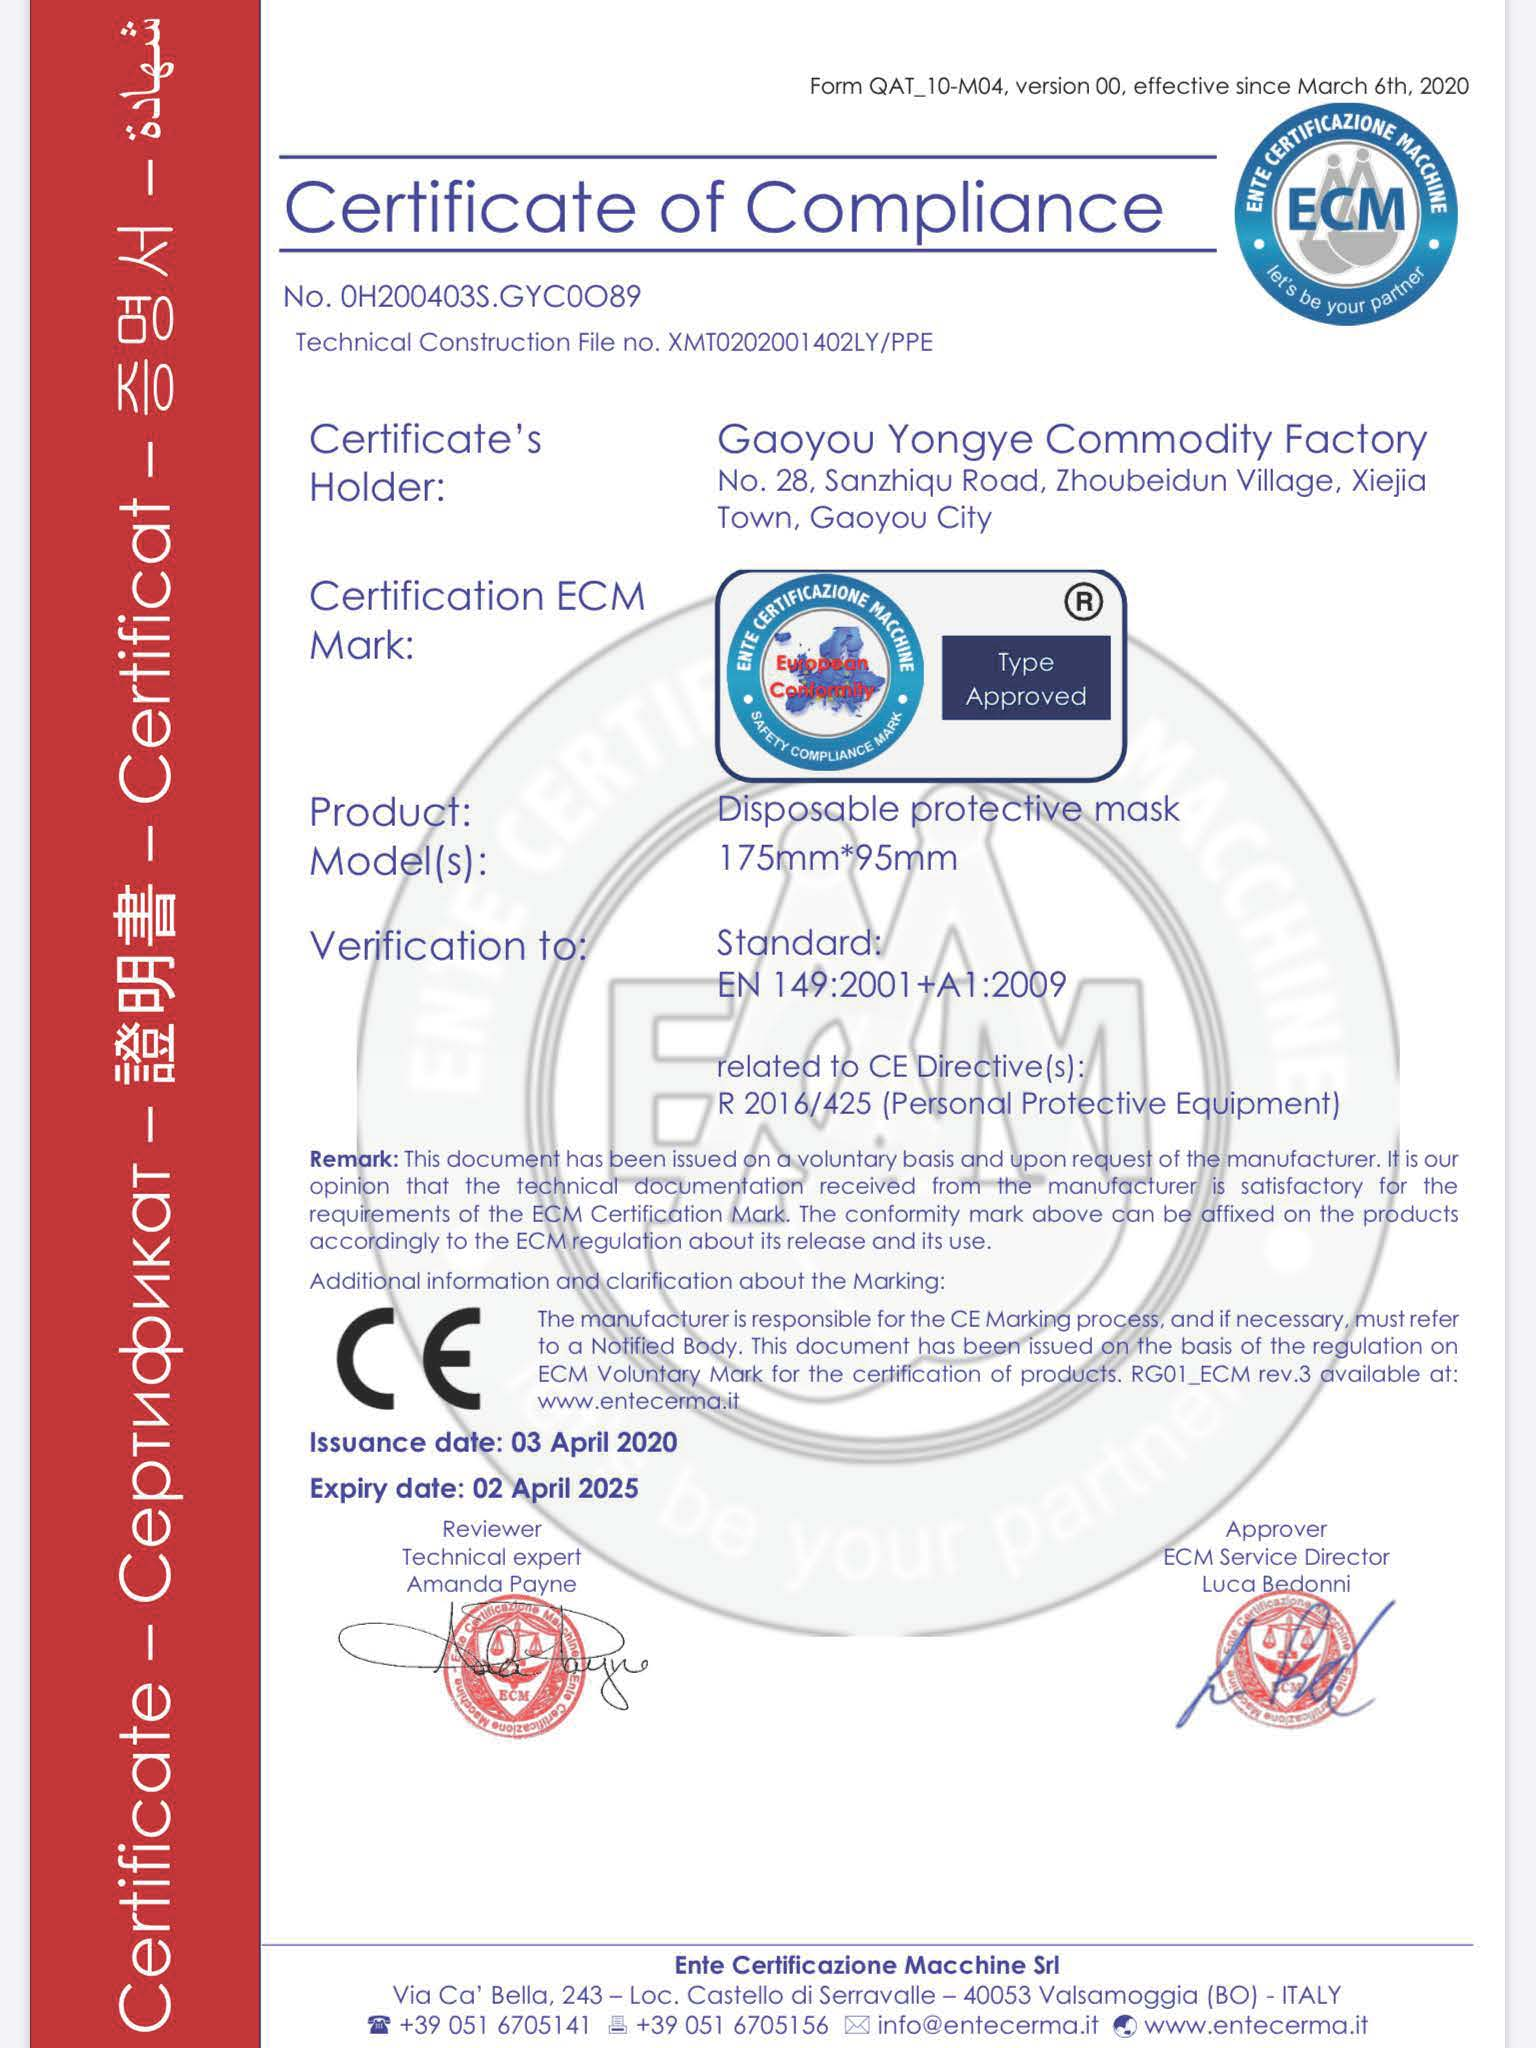 rusko s certifikatom